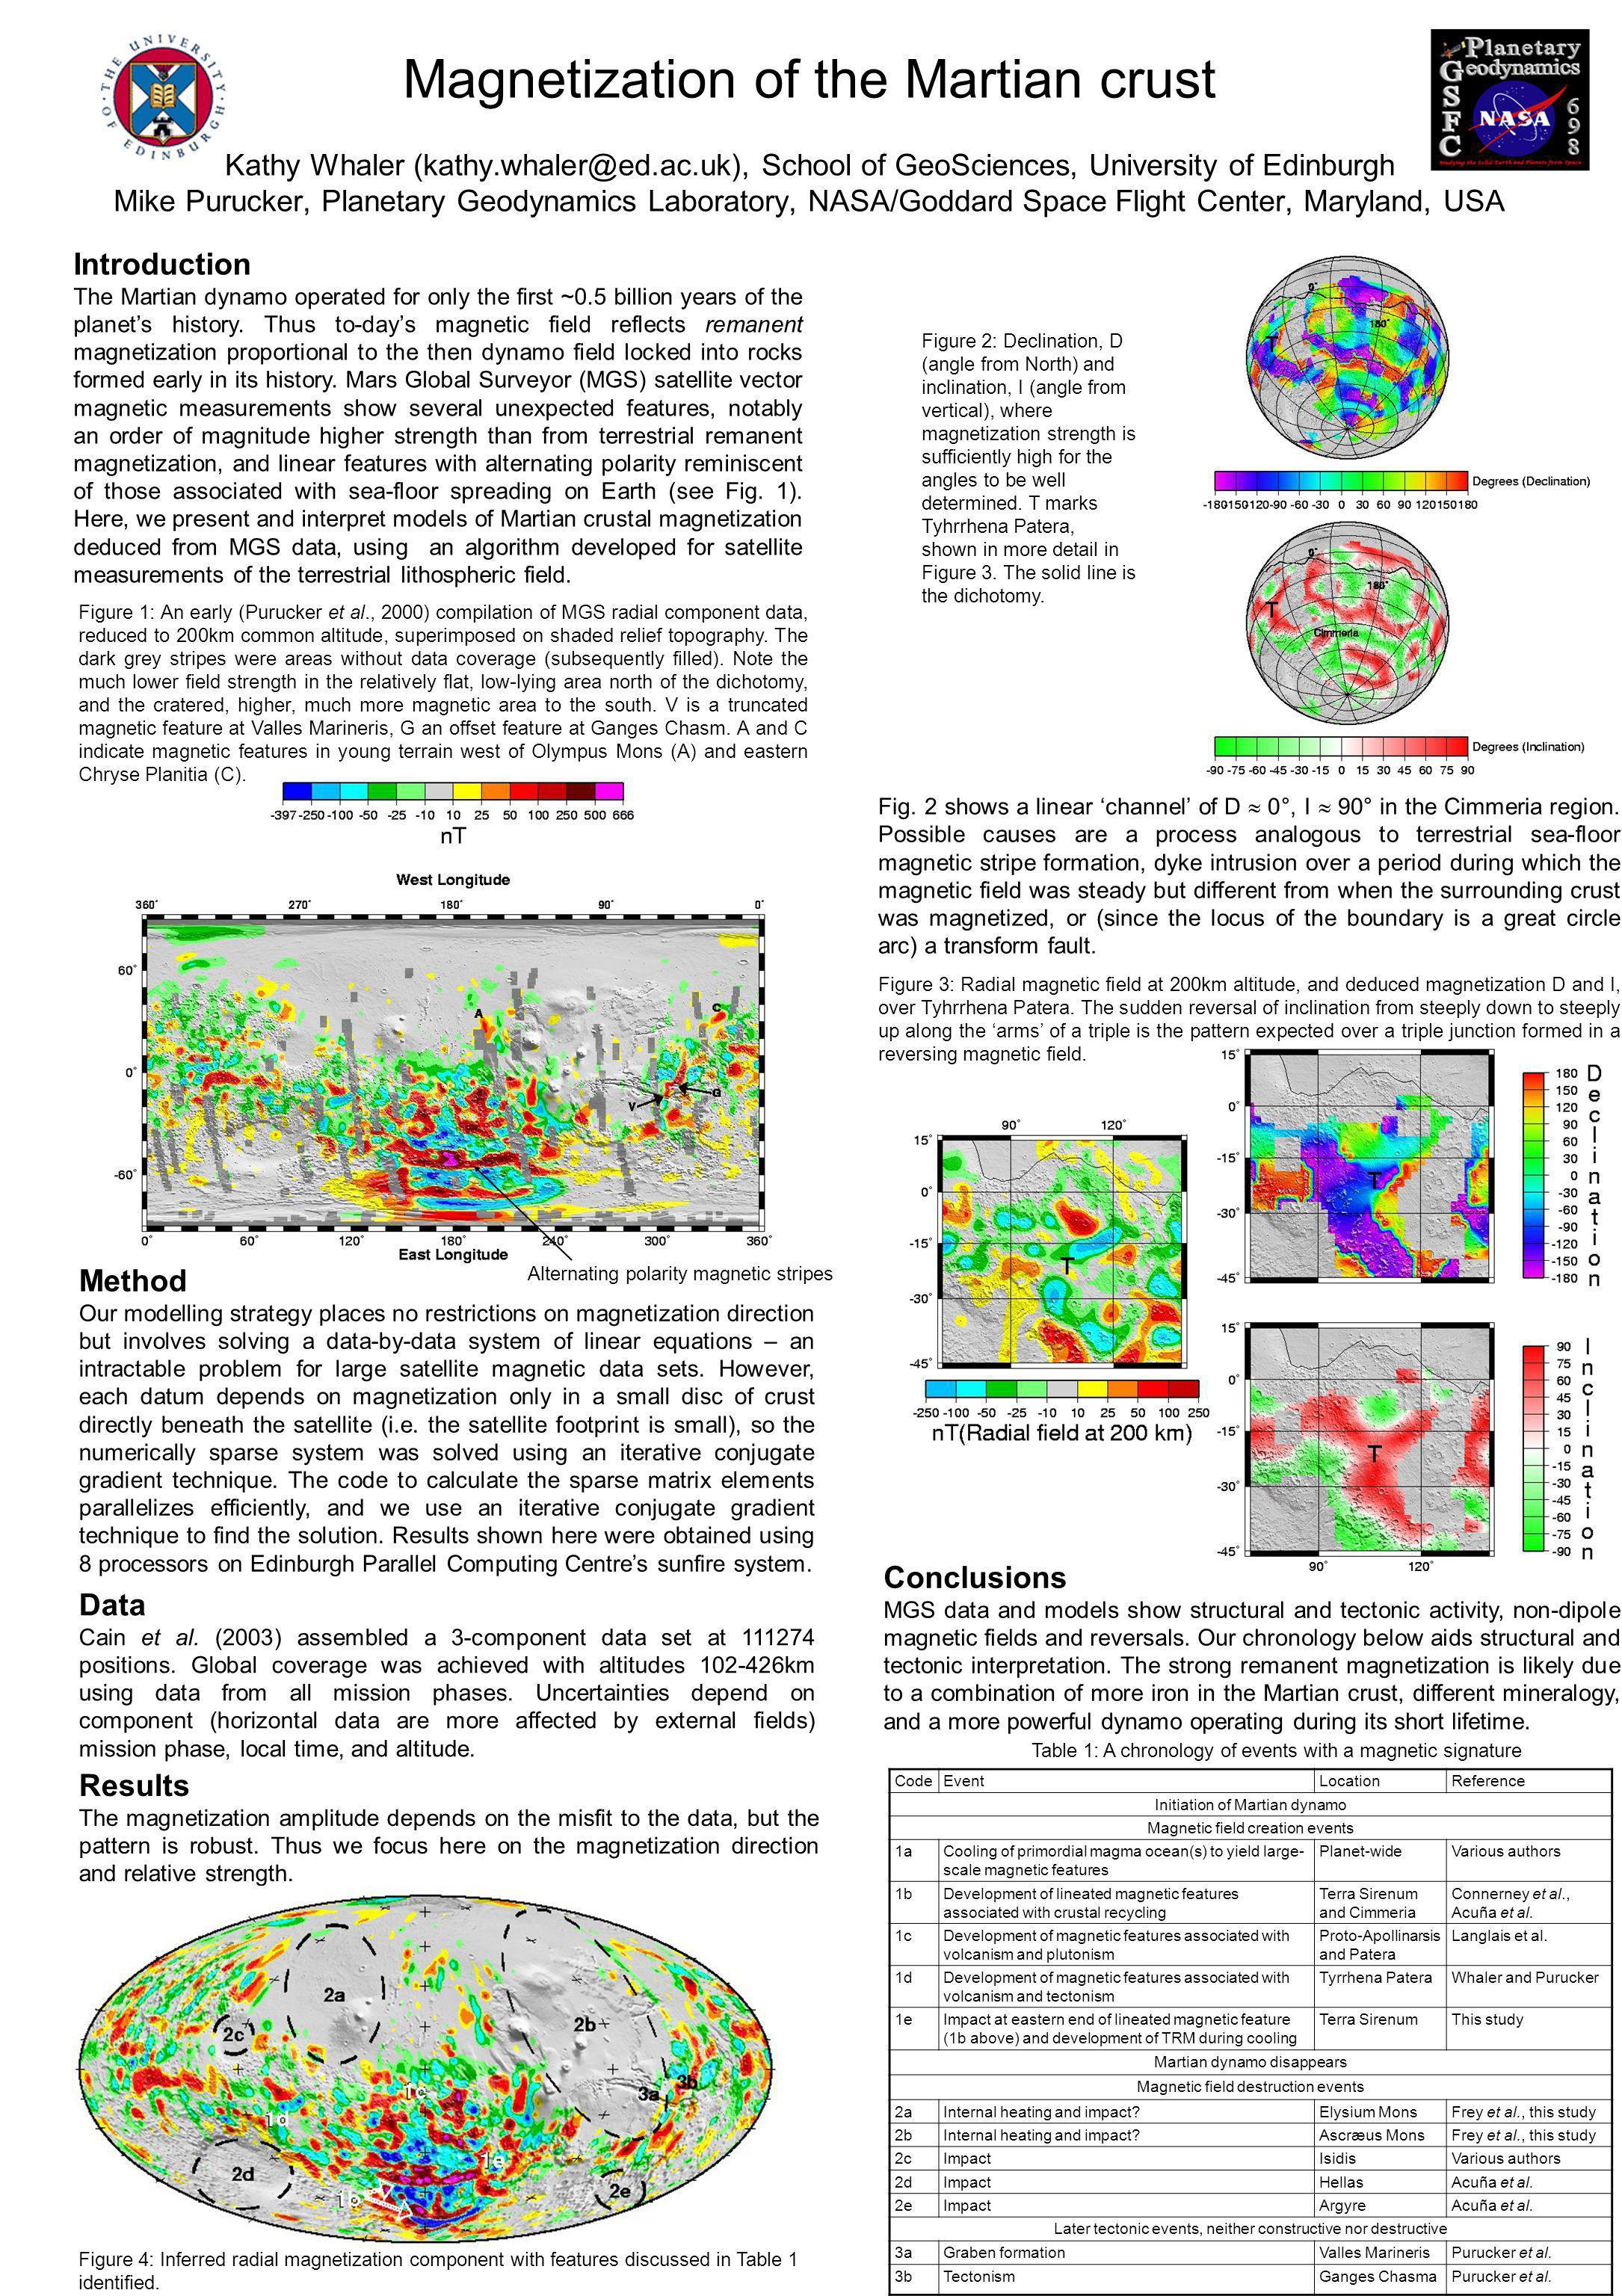 Magnetization of the Martian crust Kathy Whaler (kathy.whaler@ed.ac.uk), School of GeoSciences, University of Edinburgh Mike Purucker, Planetary Geody